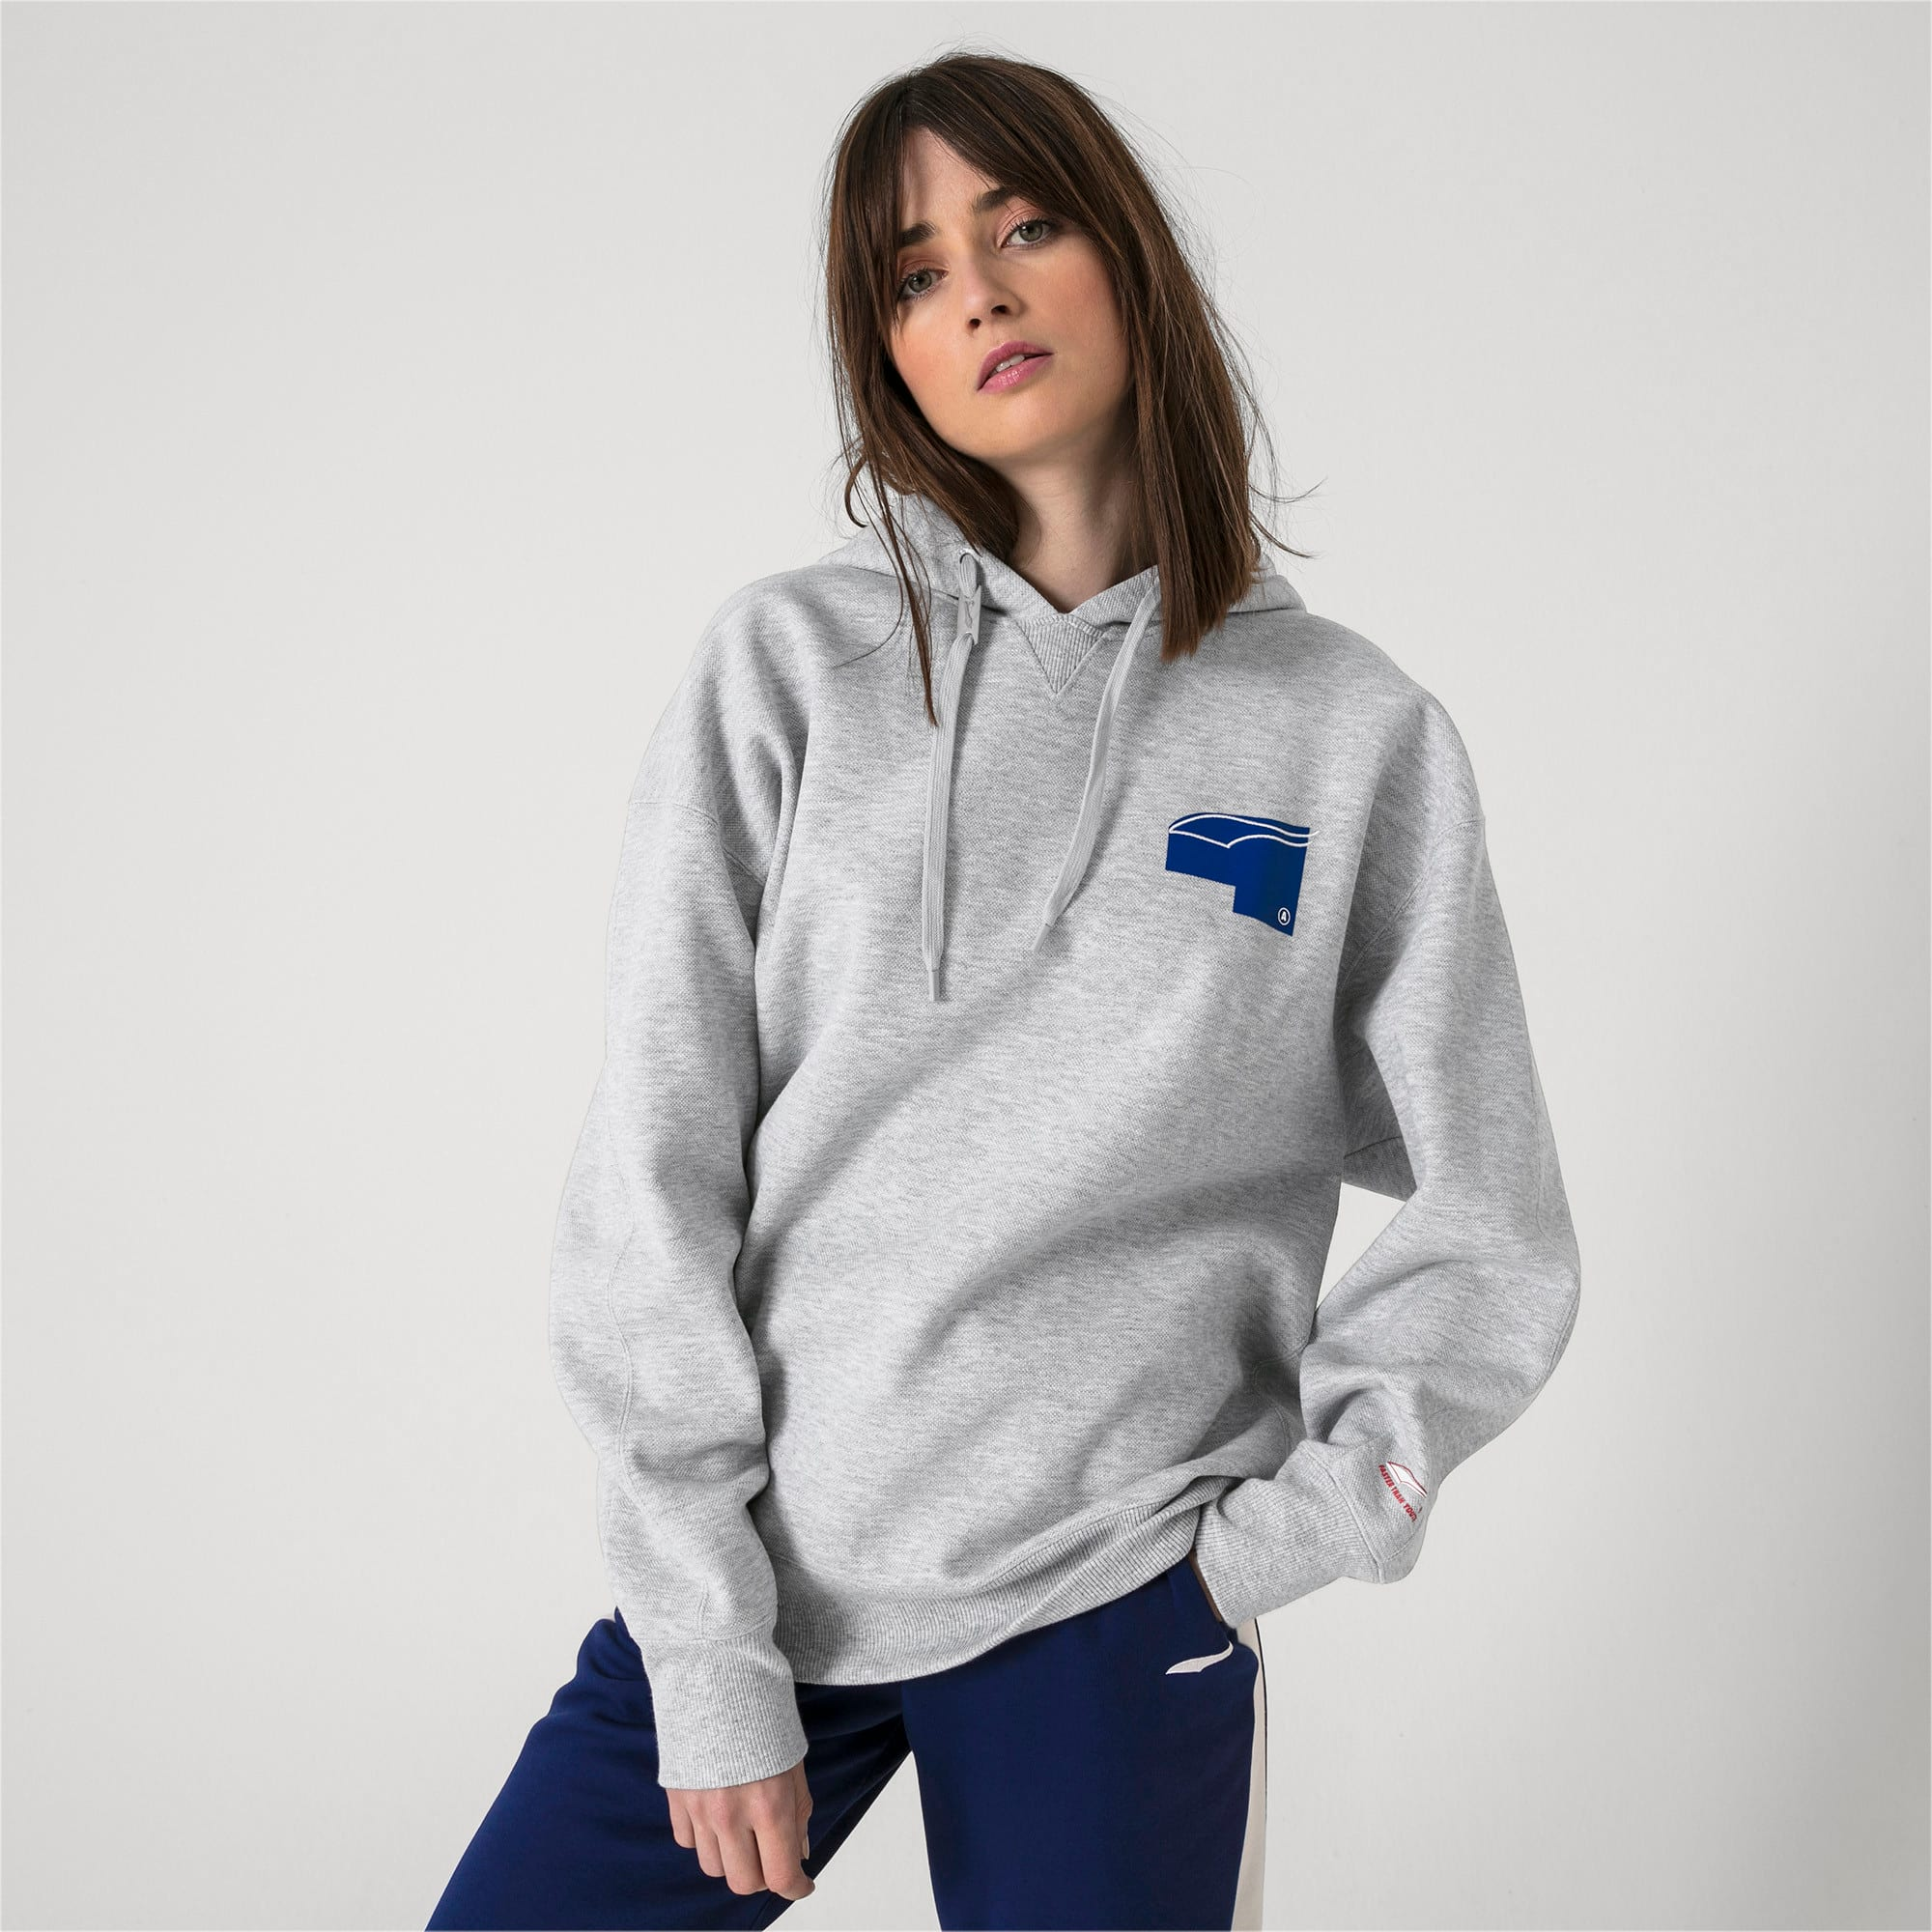 Thumbnail 6 of PUMA x ADER ERROR hoodie, Light Gray Heather, medium